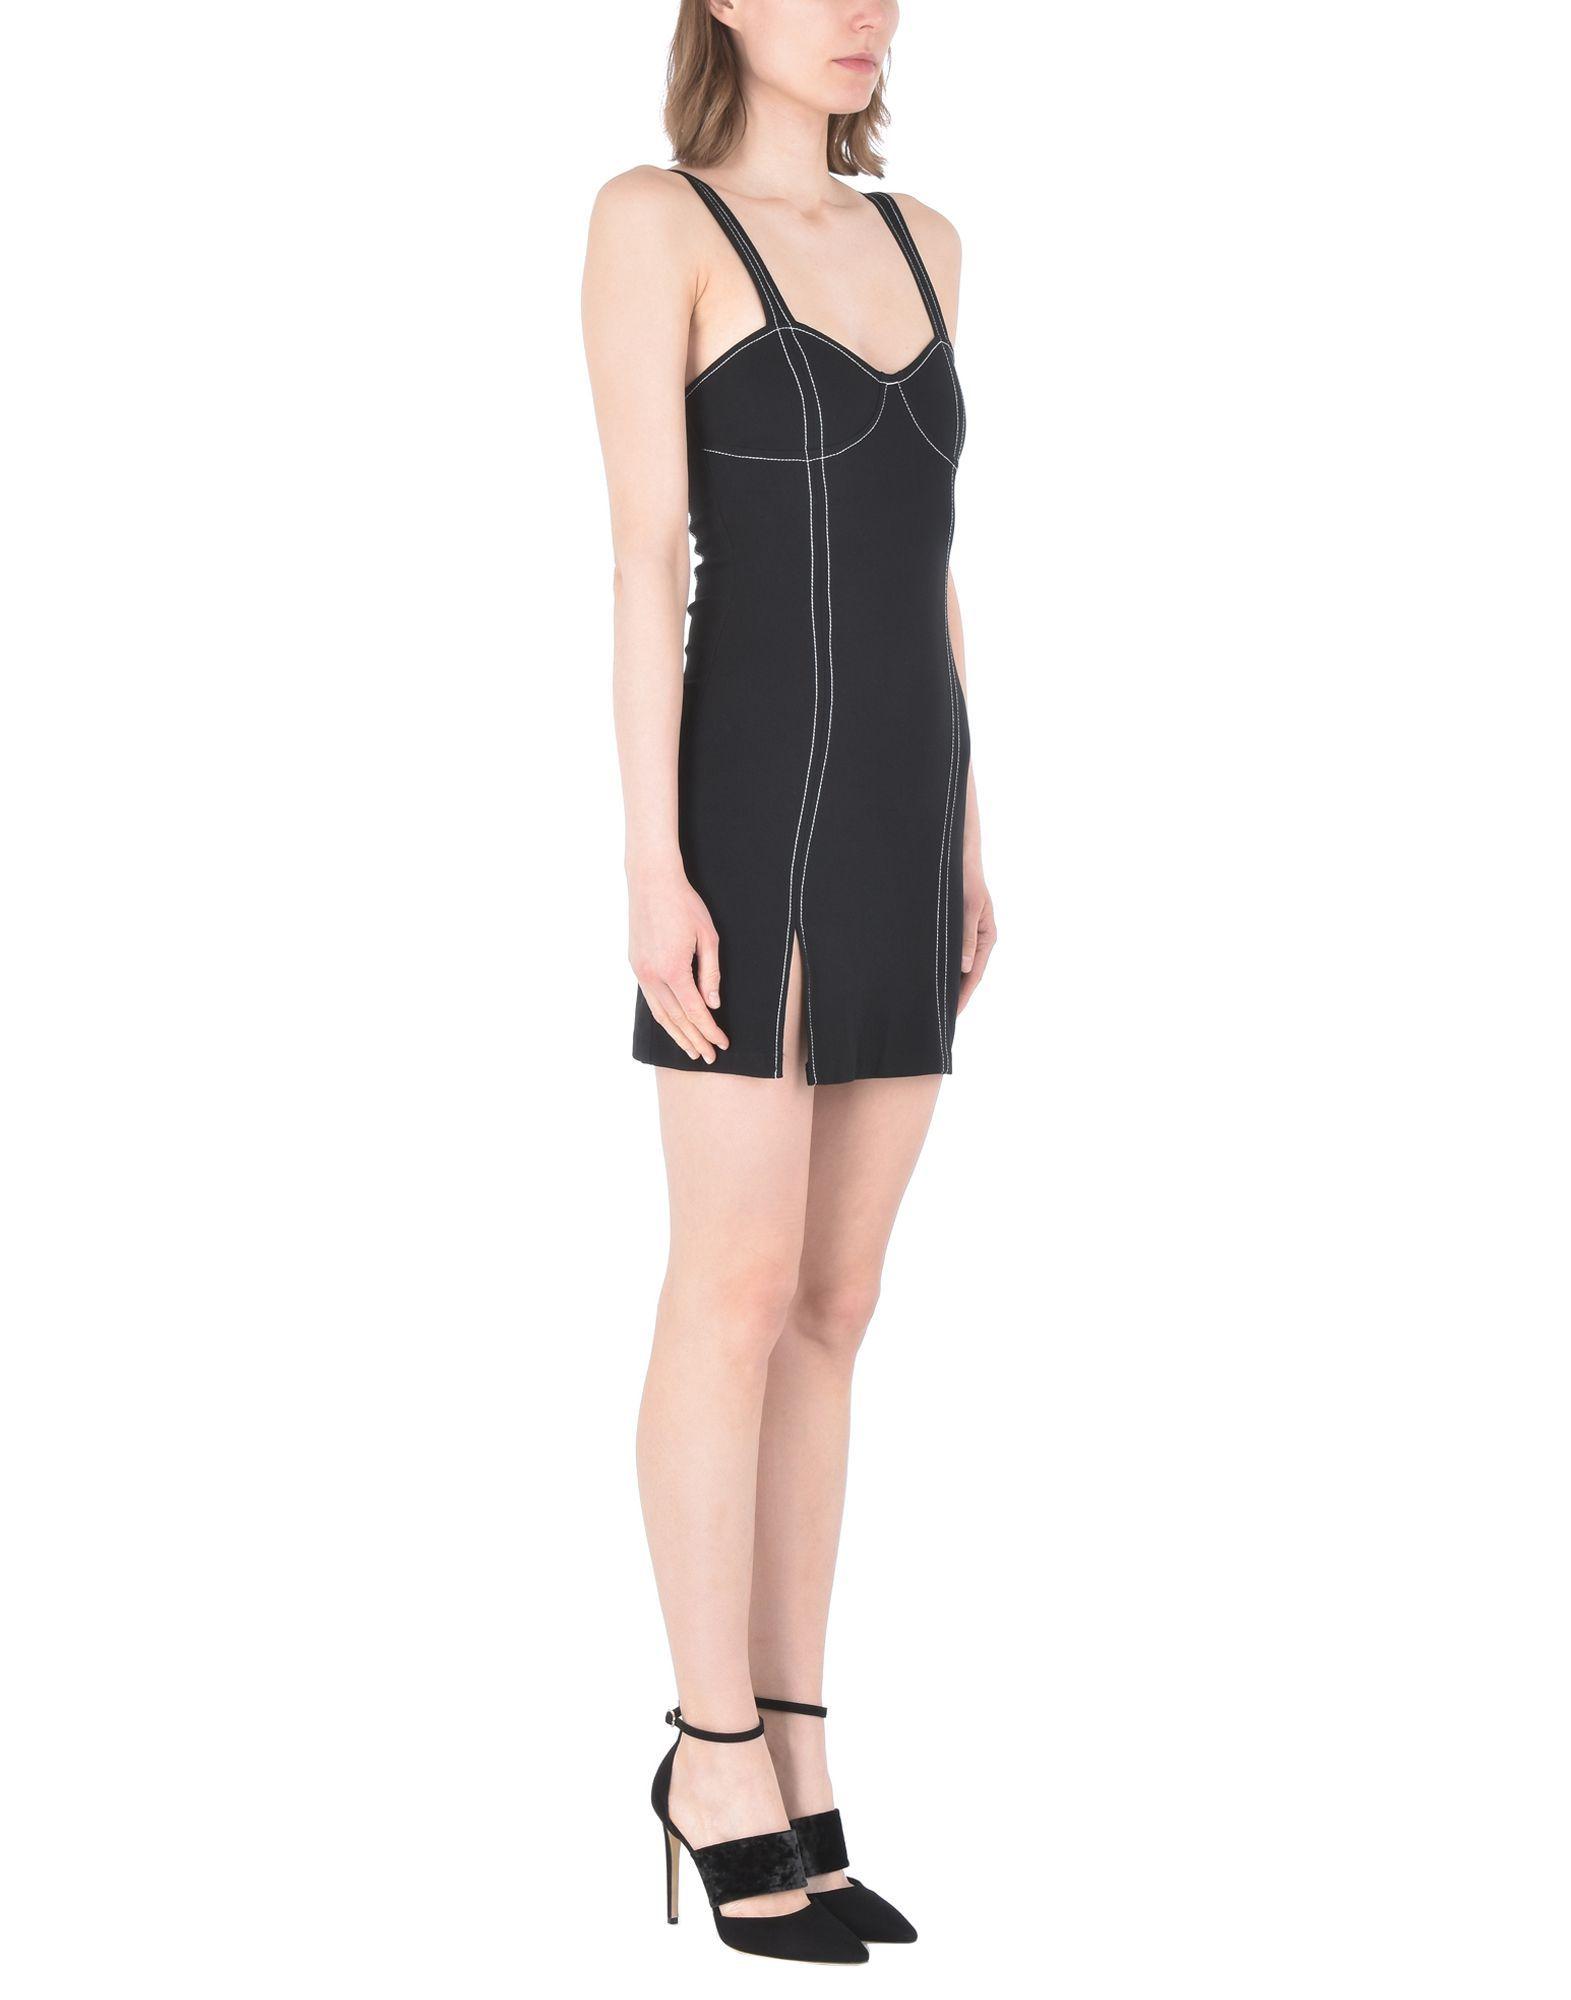 Bec & Bridge Black Crepe Dress